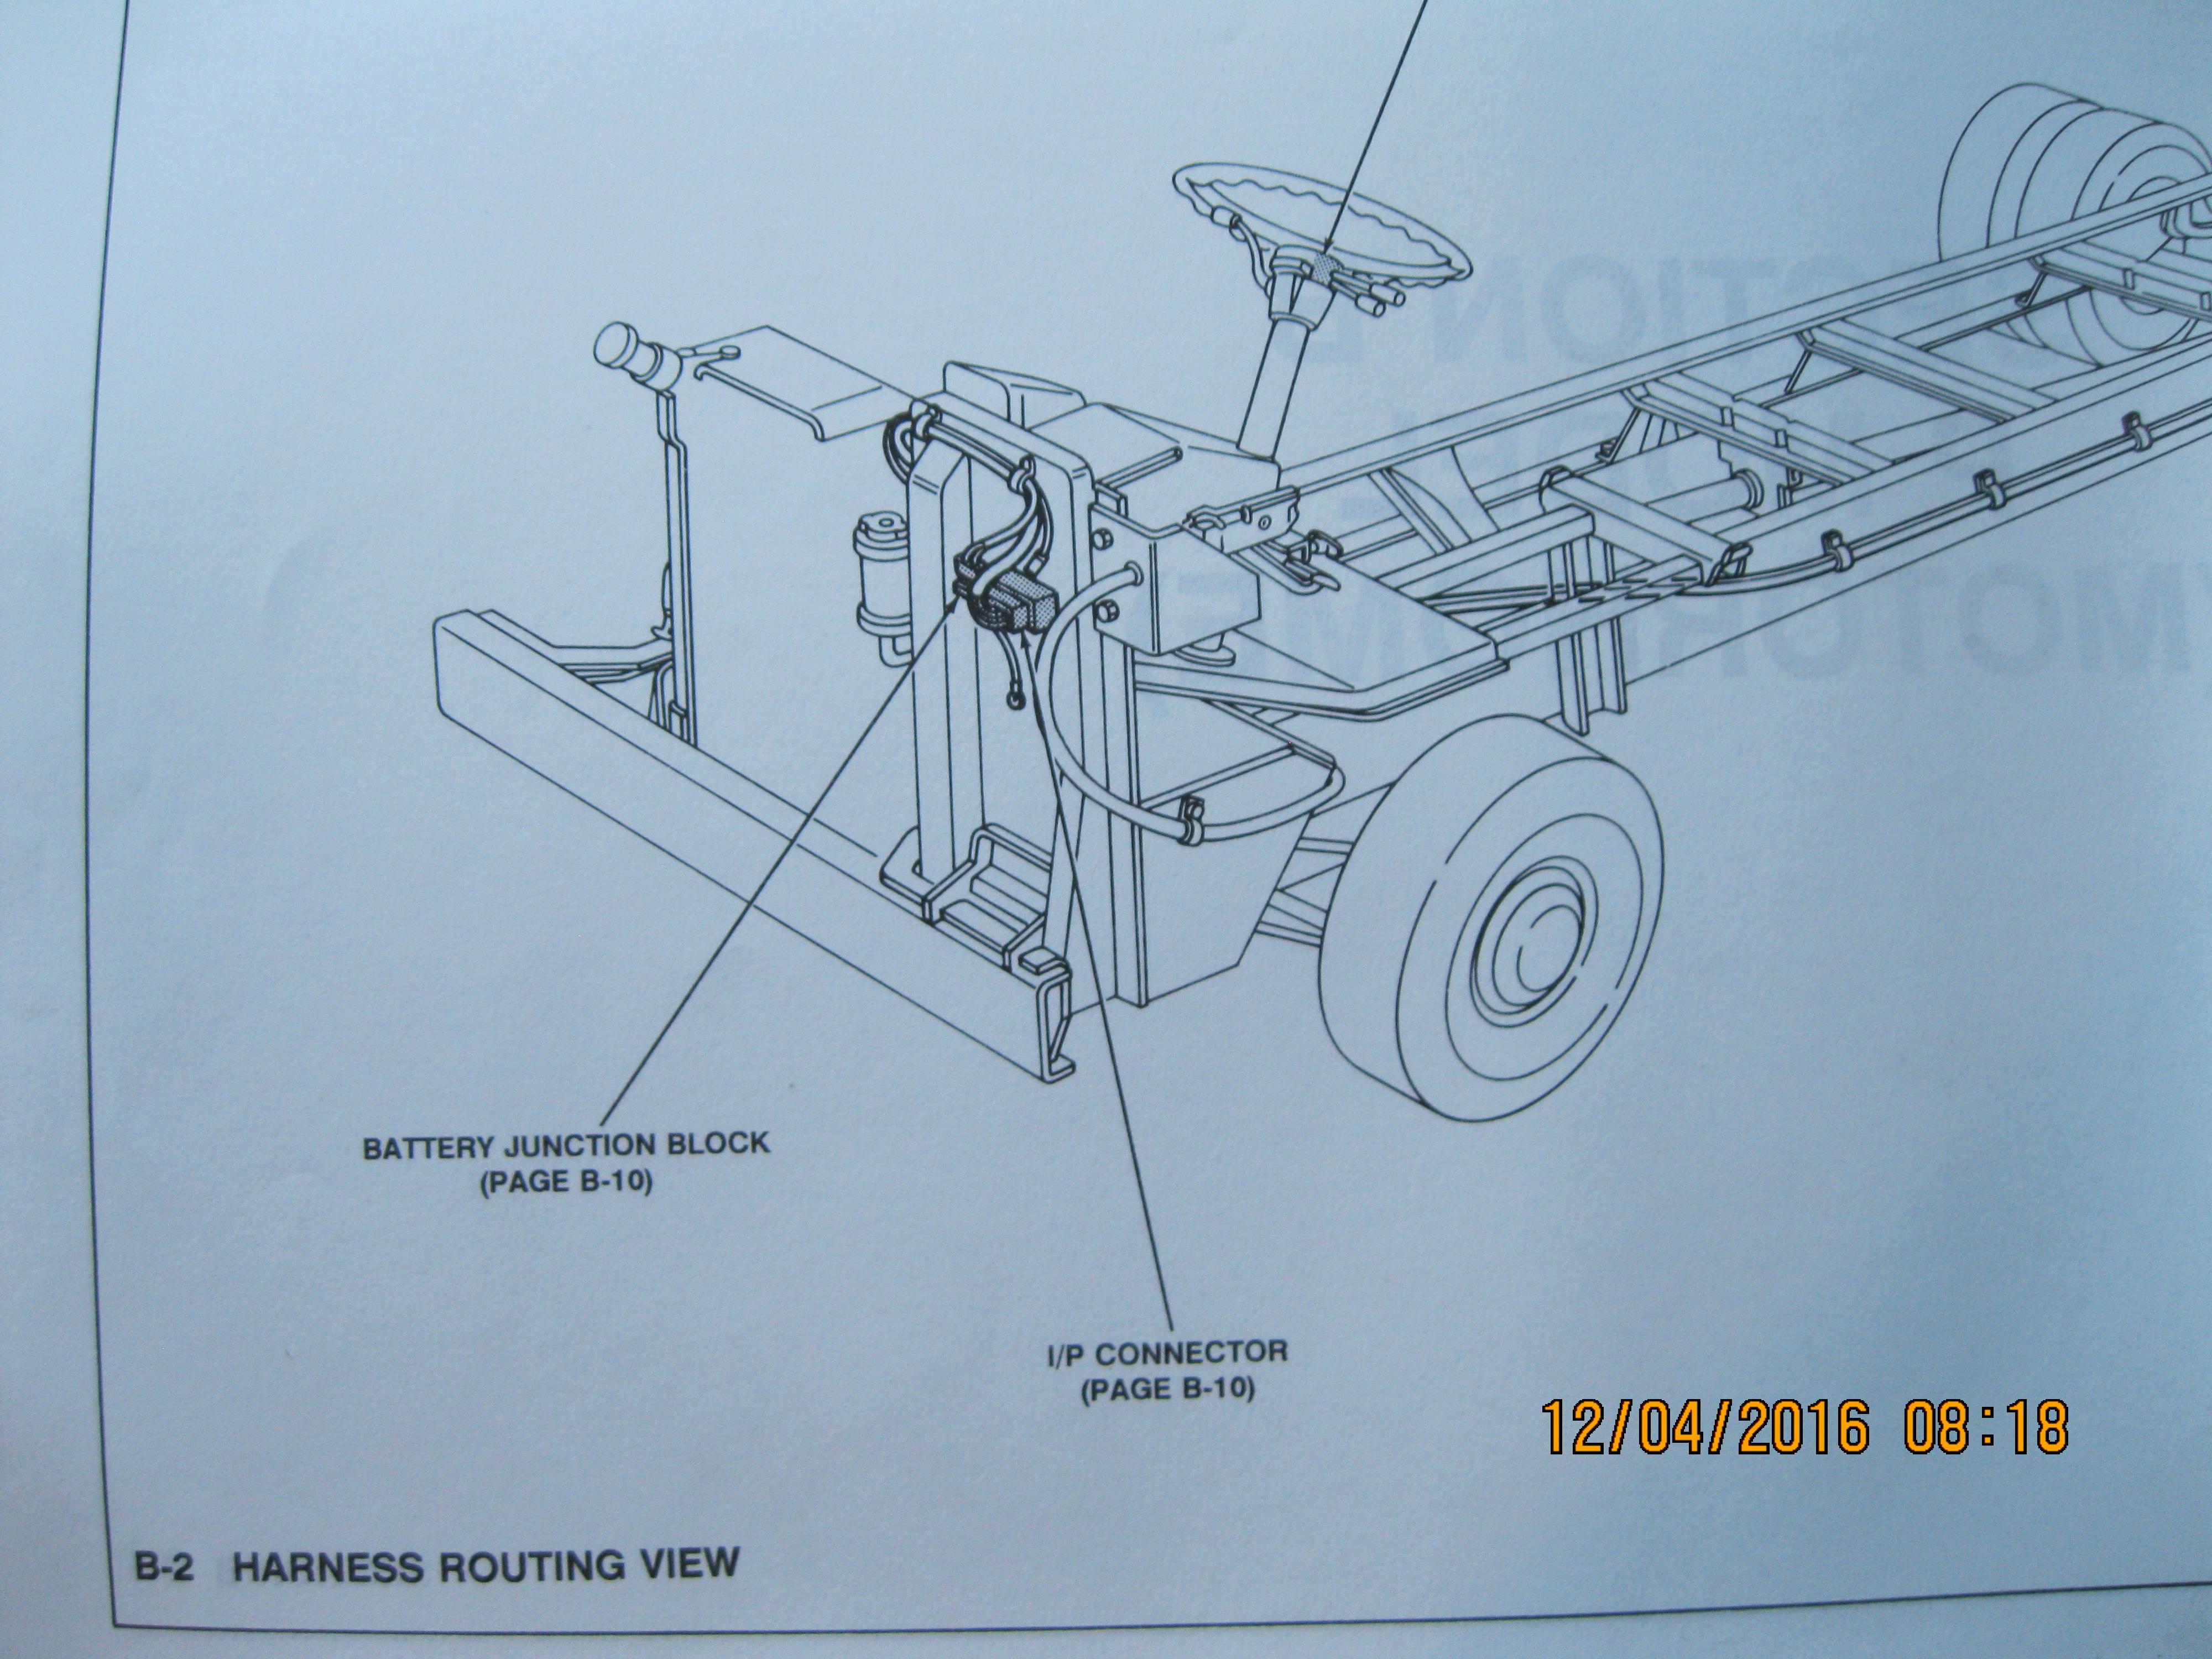 Ford Fleetwood Motorhome Wiring Diagram | Wiring Diagram - Fleetwood Motorhome Wiring Diagram Fuse